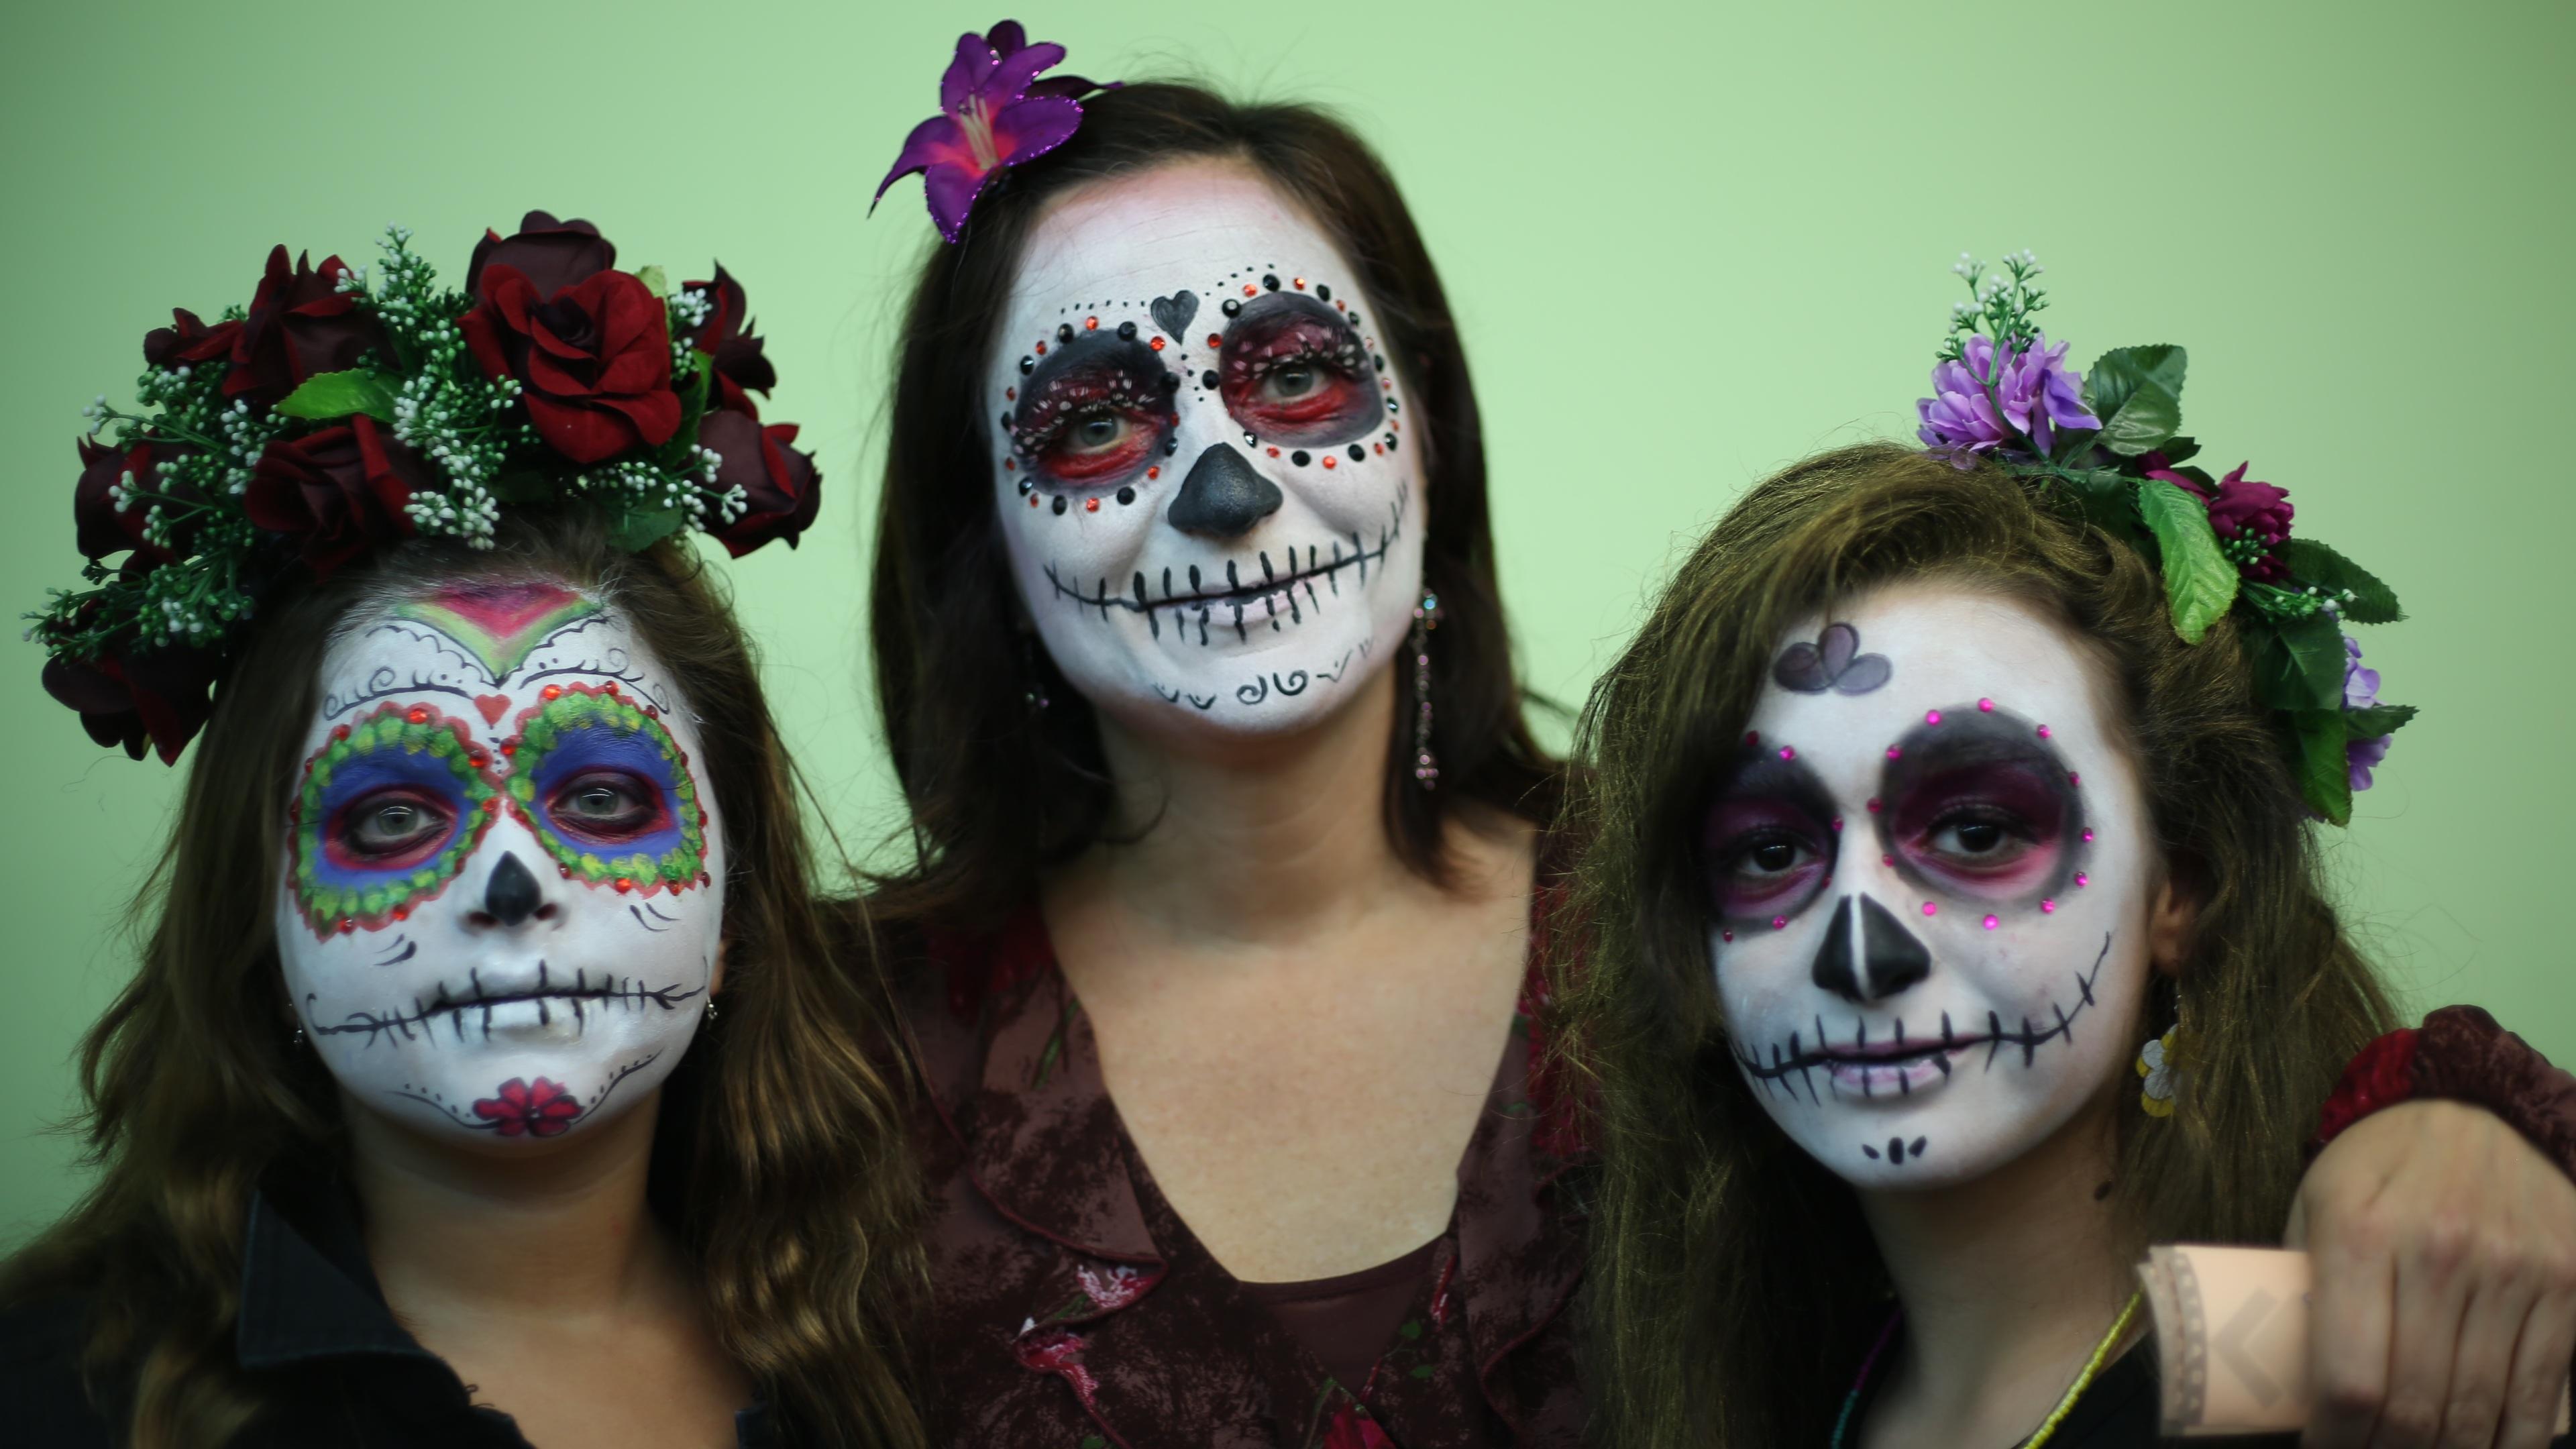 maquillage jour des morts mexique. Black Bedroom Furniture Sets. Home Design Ideas